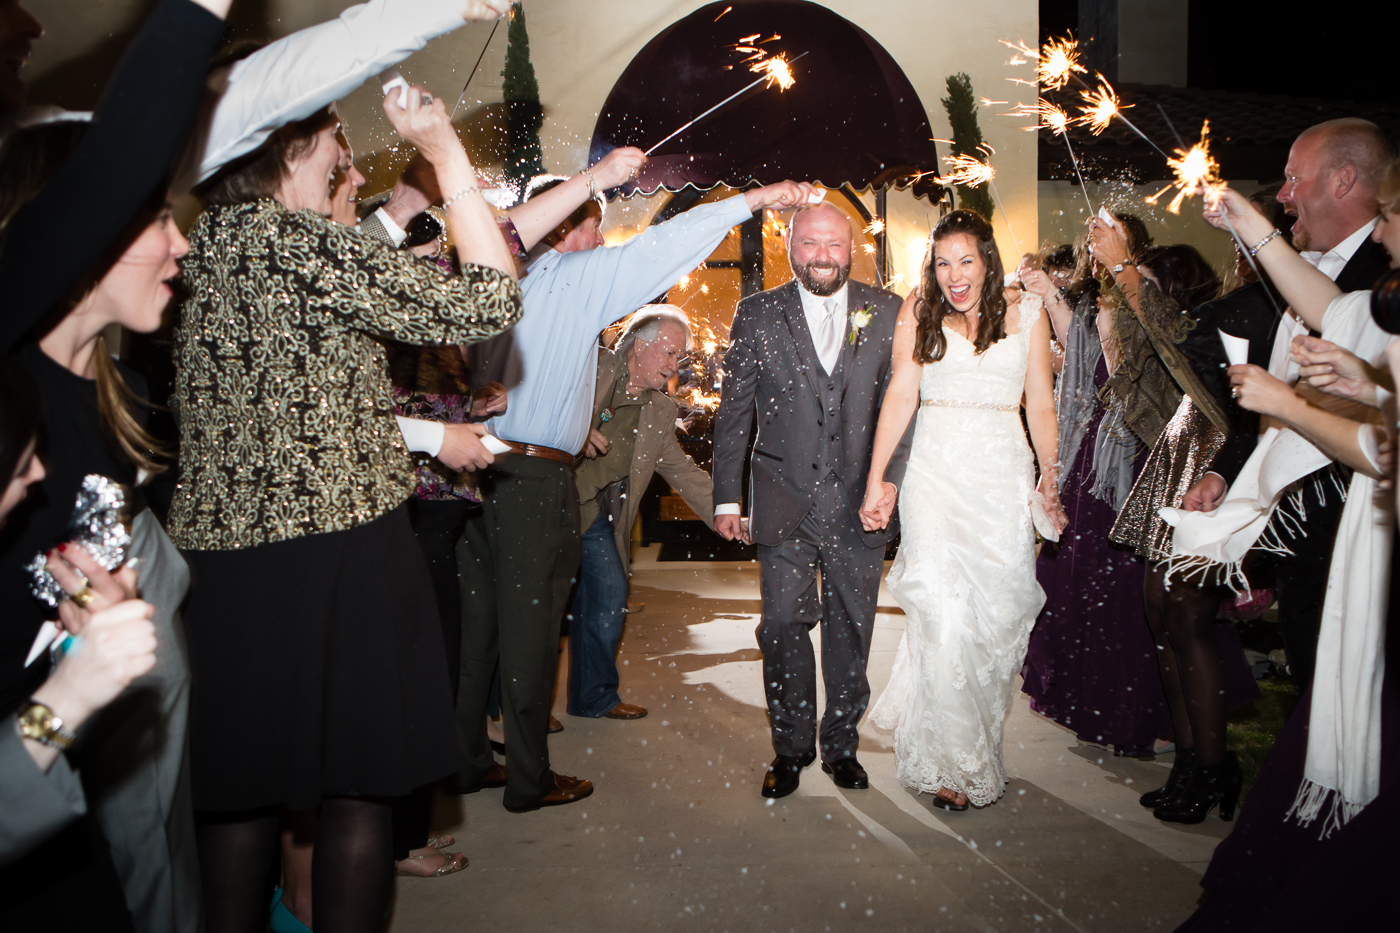 Austin-wedding-photo-and-video-035.jpg